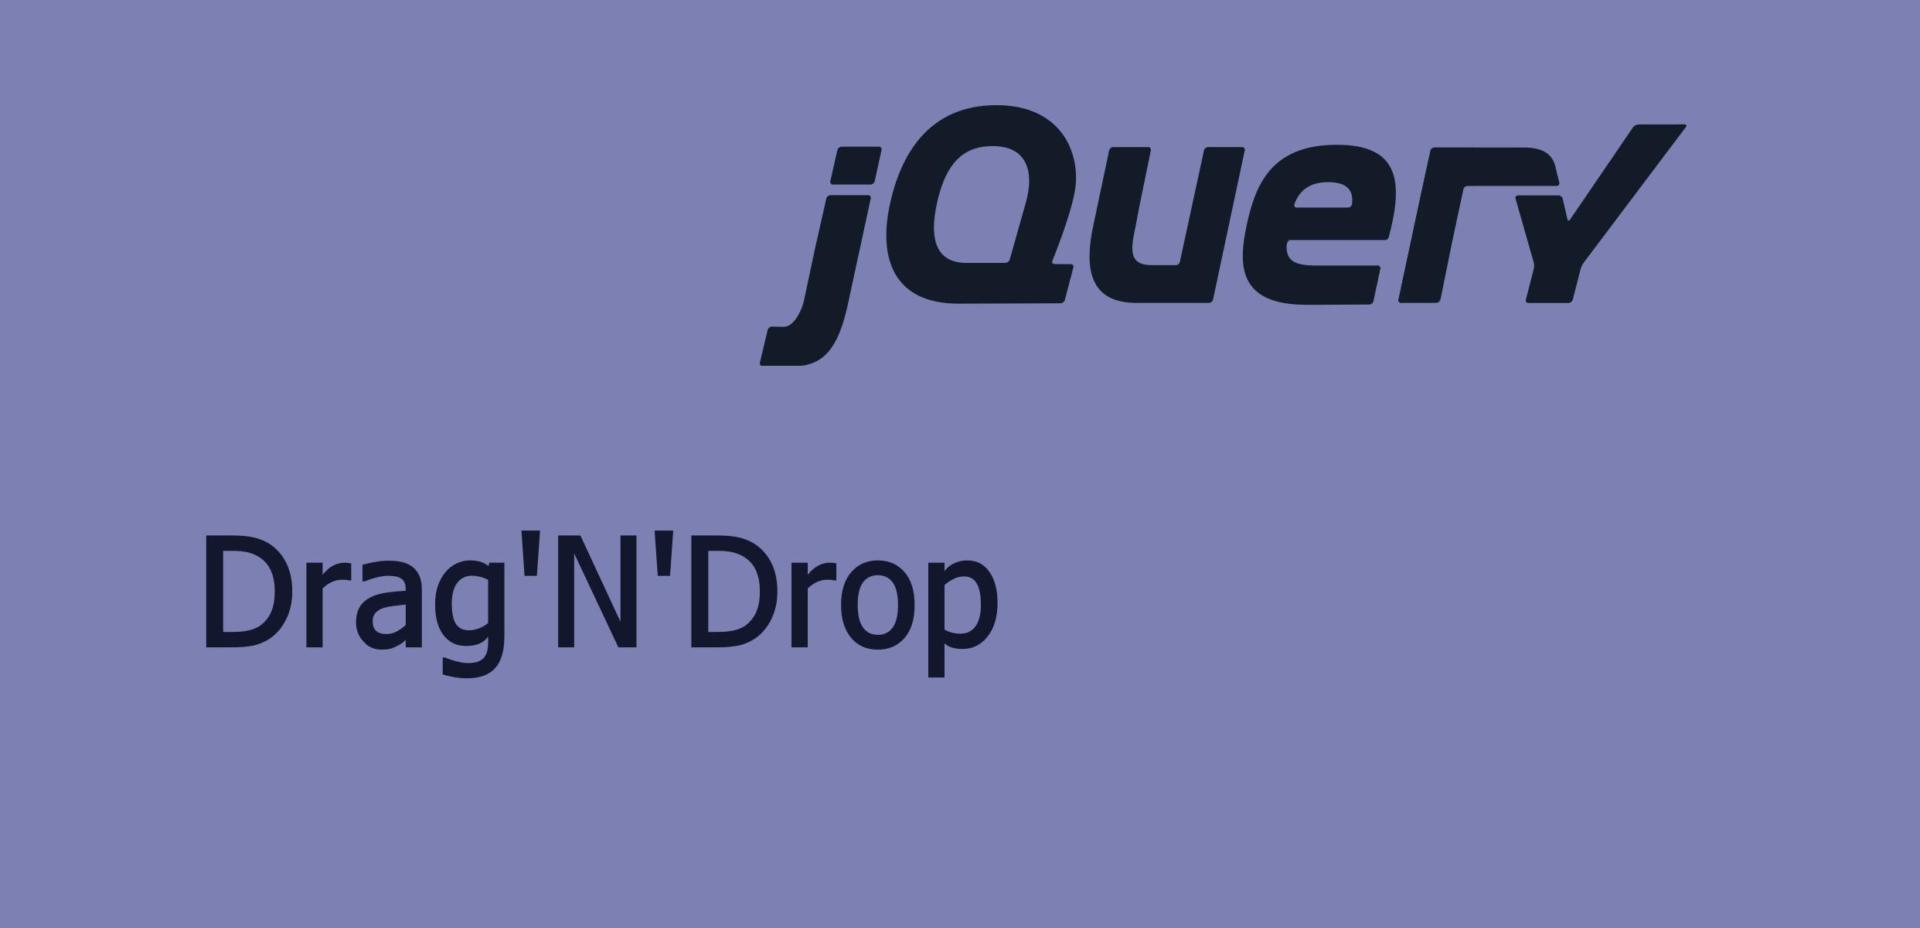 Drag'N'Drop JQuery